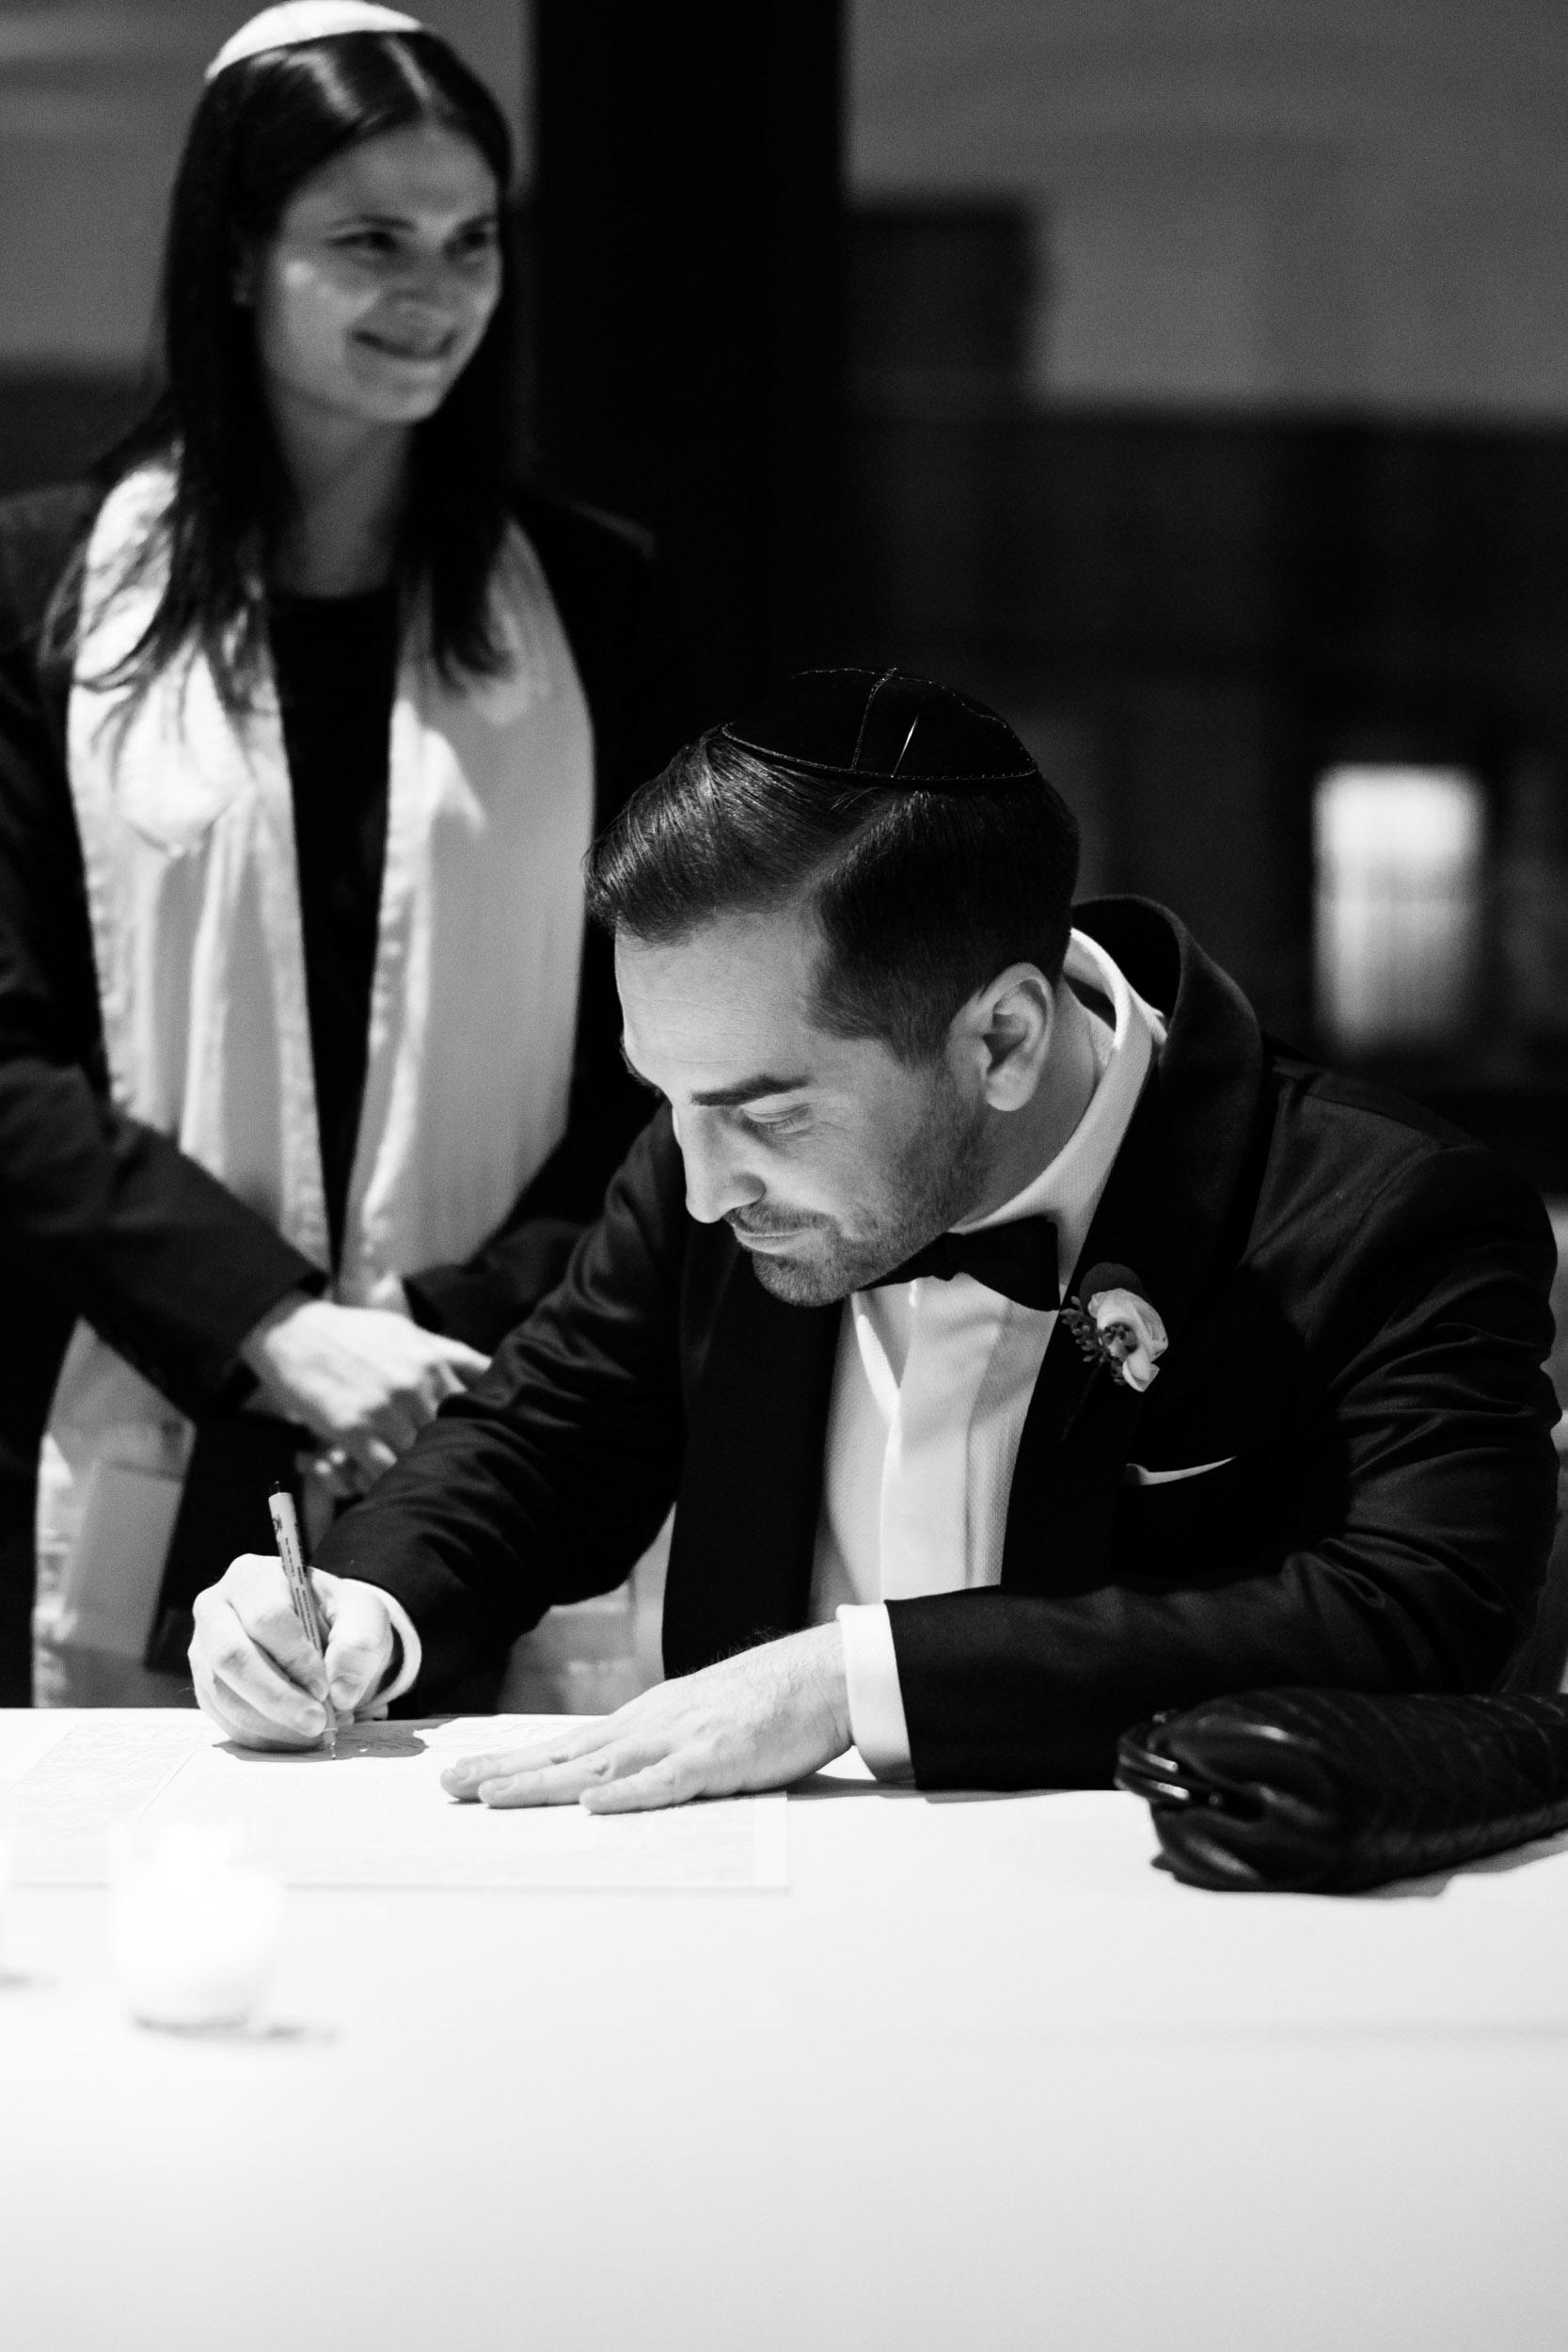 Groom signs the ketubah at Bridgeport Art Center wedding in Chicago